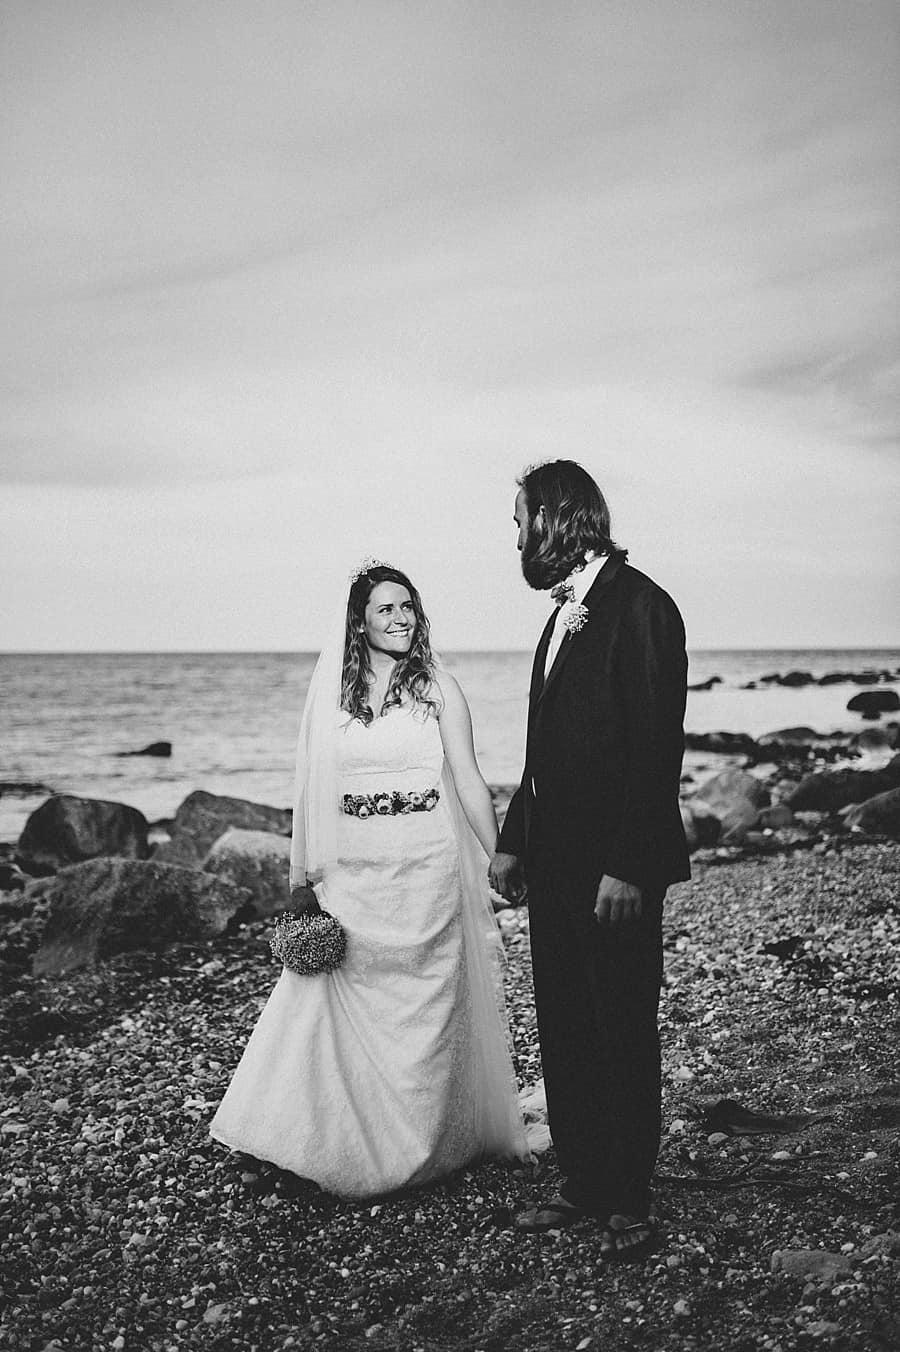 hochzeitsfotograf_thomasschwede_after_wedding_fotos_auf_fehmarn_0257